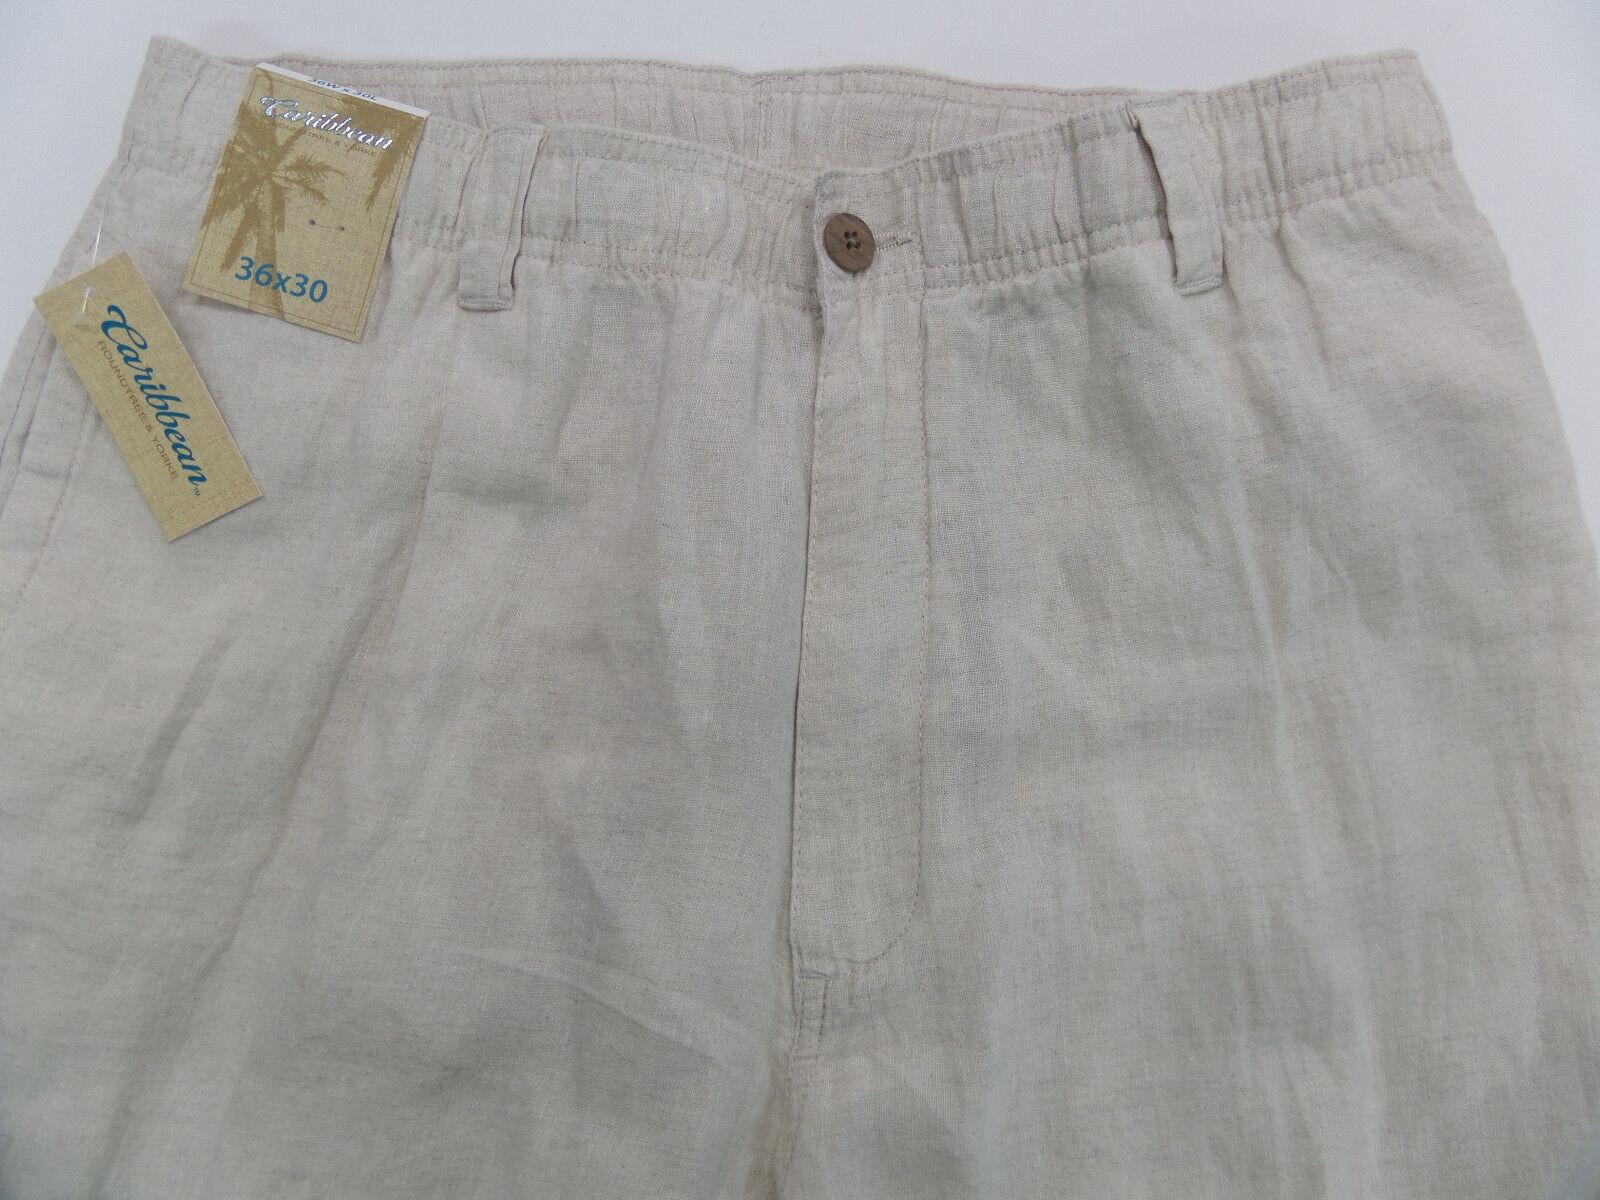 Men's CARIBBEAN Natural Light Khaki LINEN Drawstring Pants 36 x 30 NWT